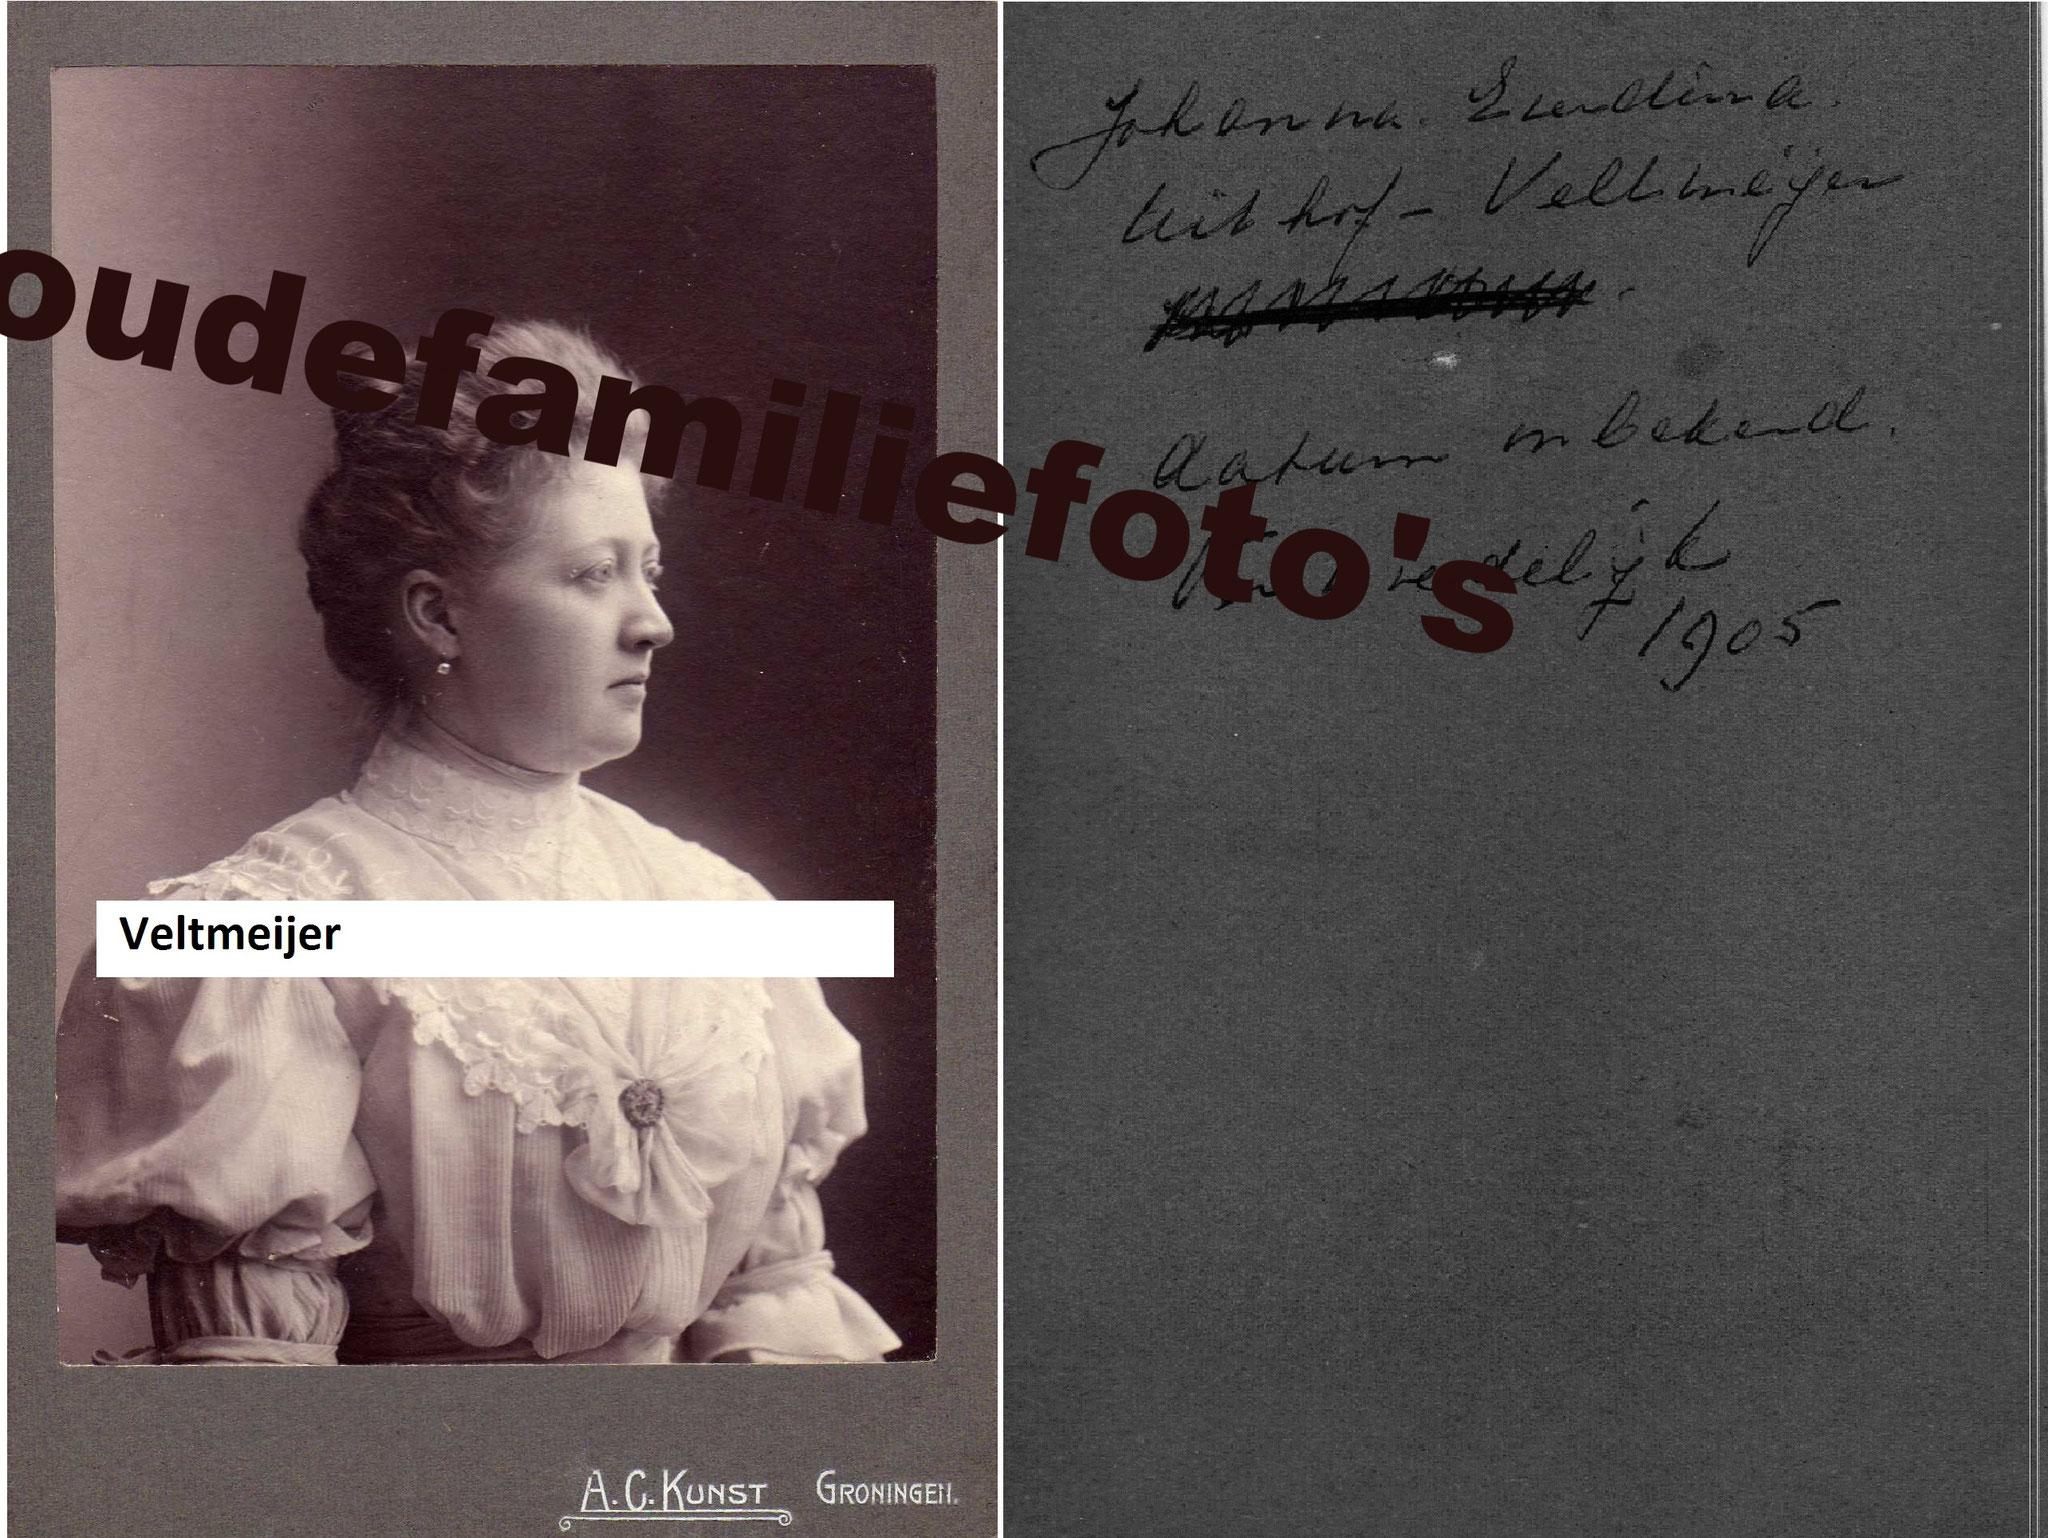 Veltmeijer, Johanna Everdina. geb: 12-8-1871 Rotterdam ovl: 27-11-1931. gehuwd met Carel Johan Uithof. € 4,00